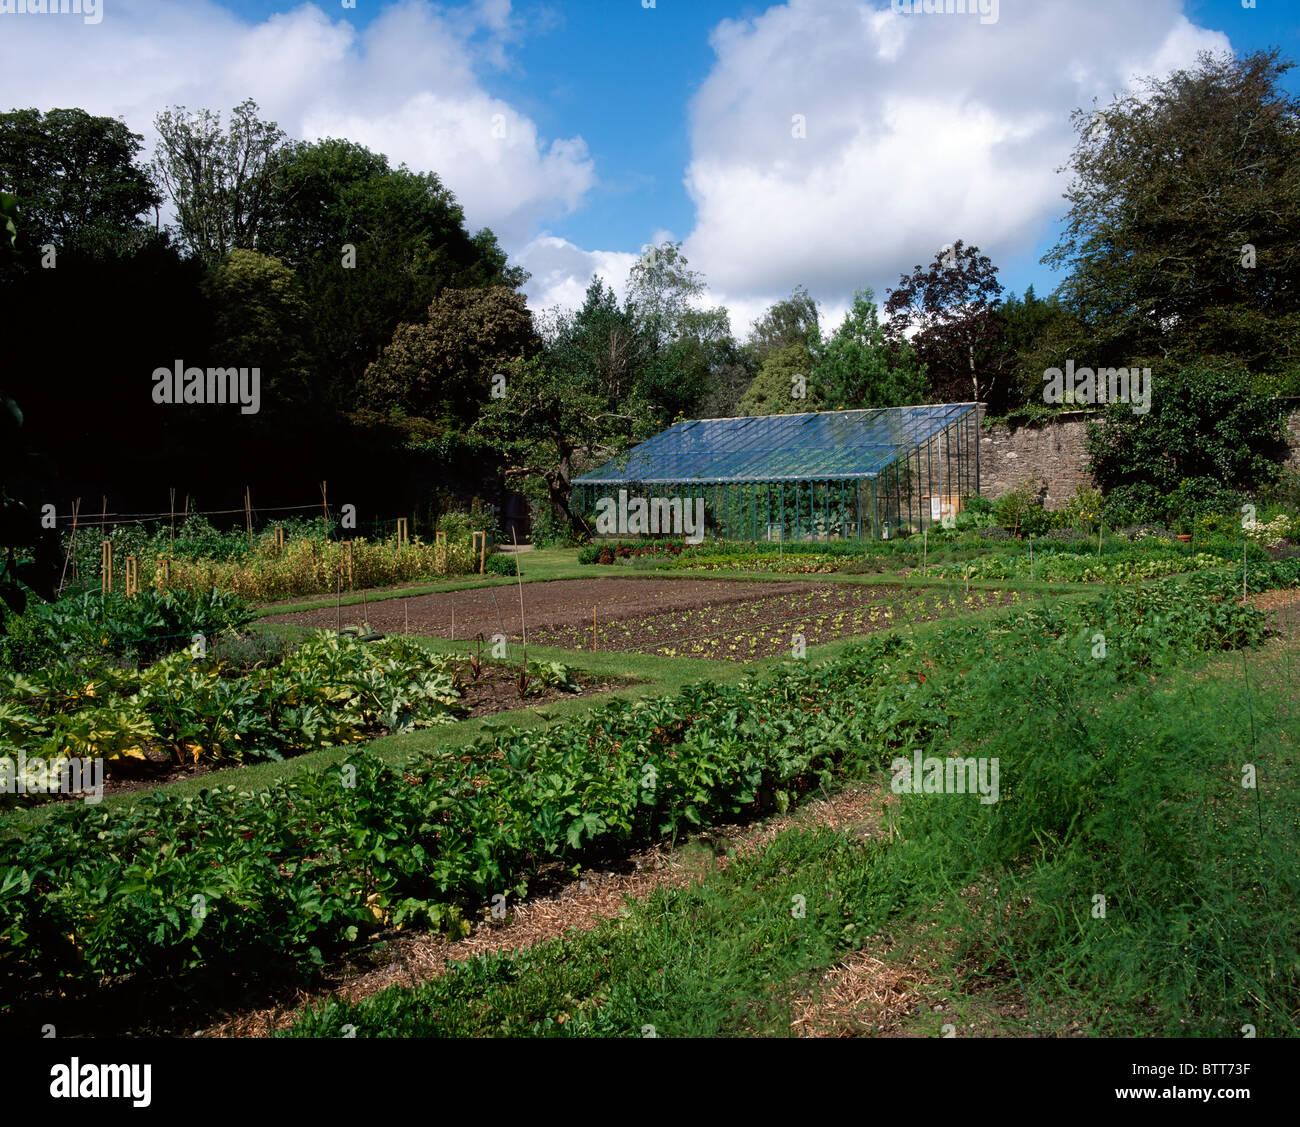 Creagh, Skibbereen, Co Cork, Ireland, Vegetable Beds In A Walled Garden - Stock Image